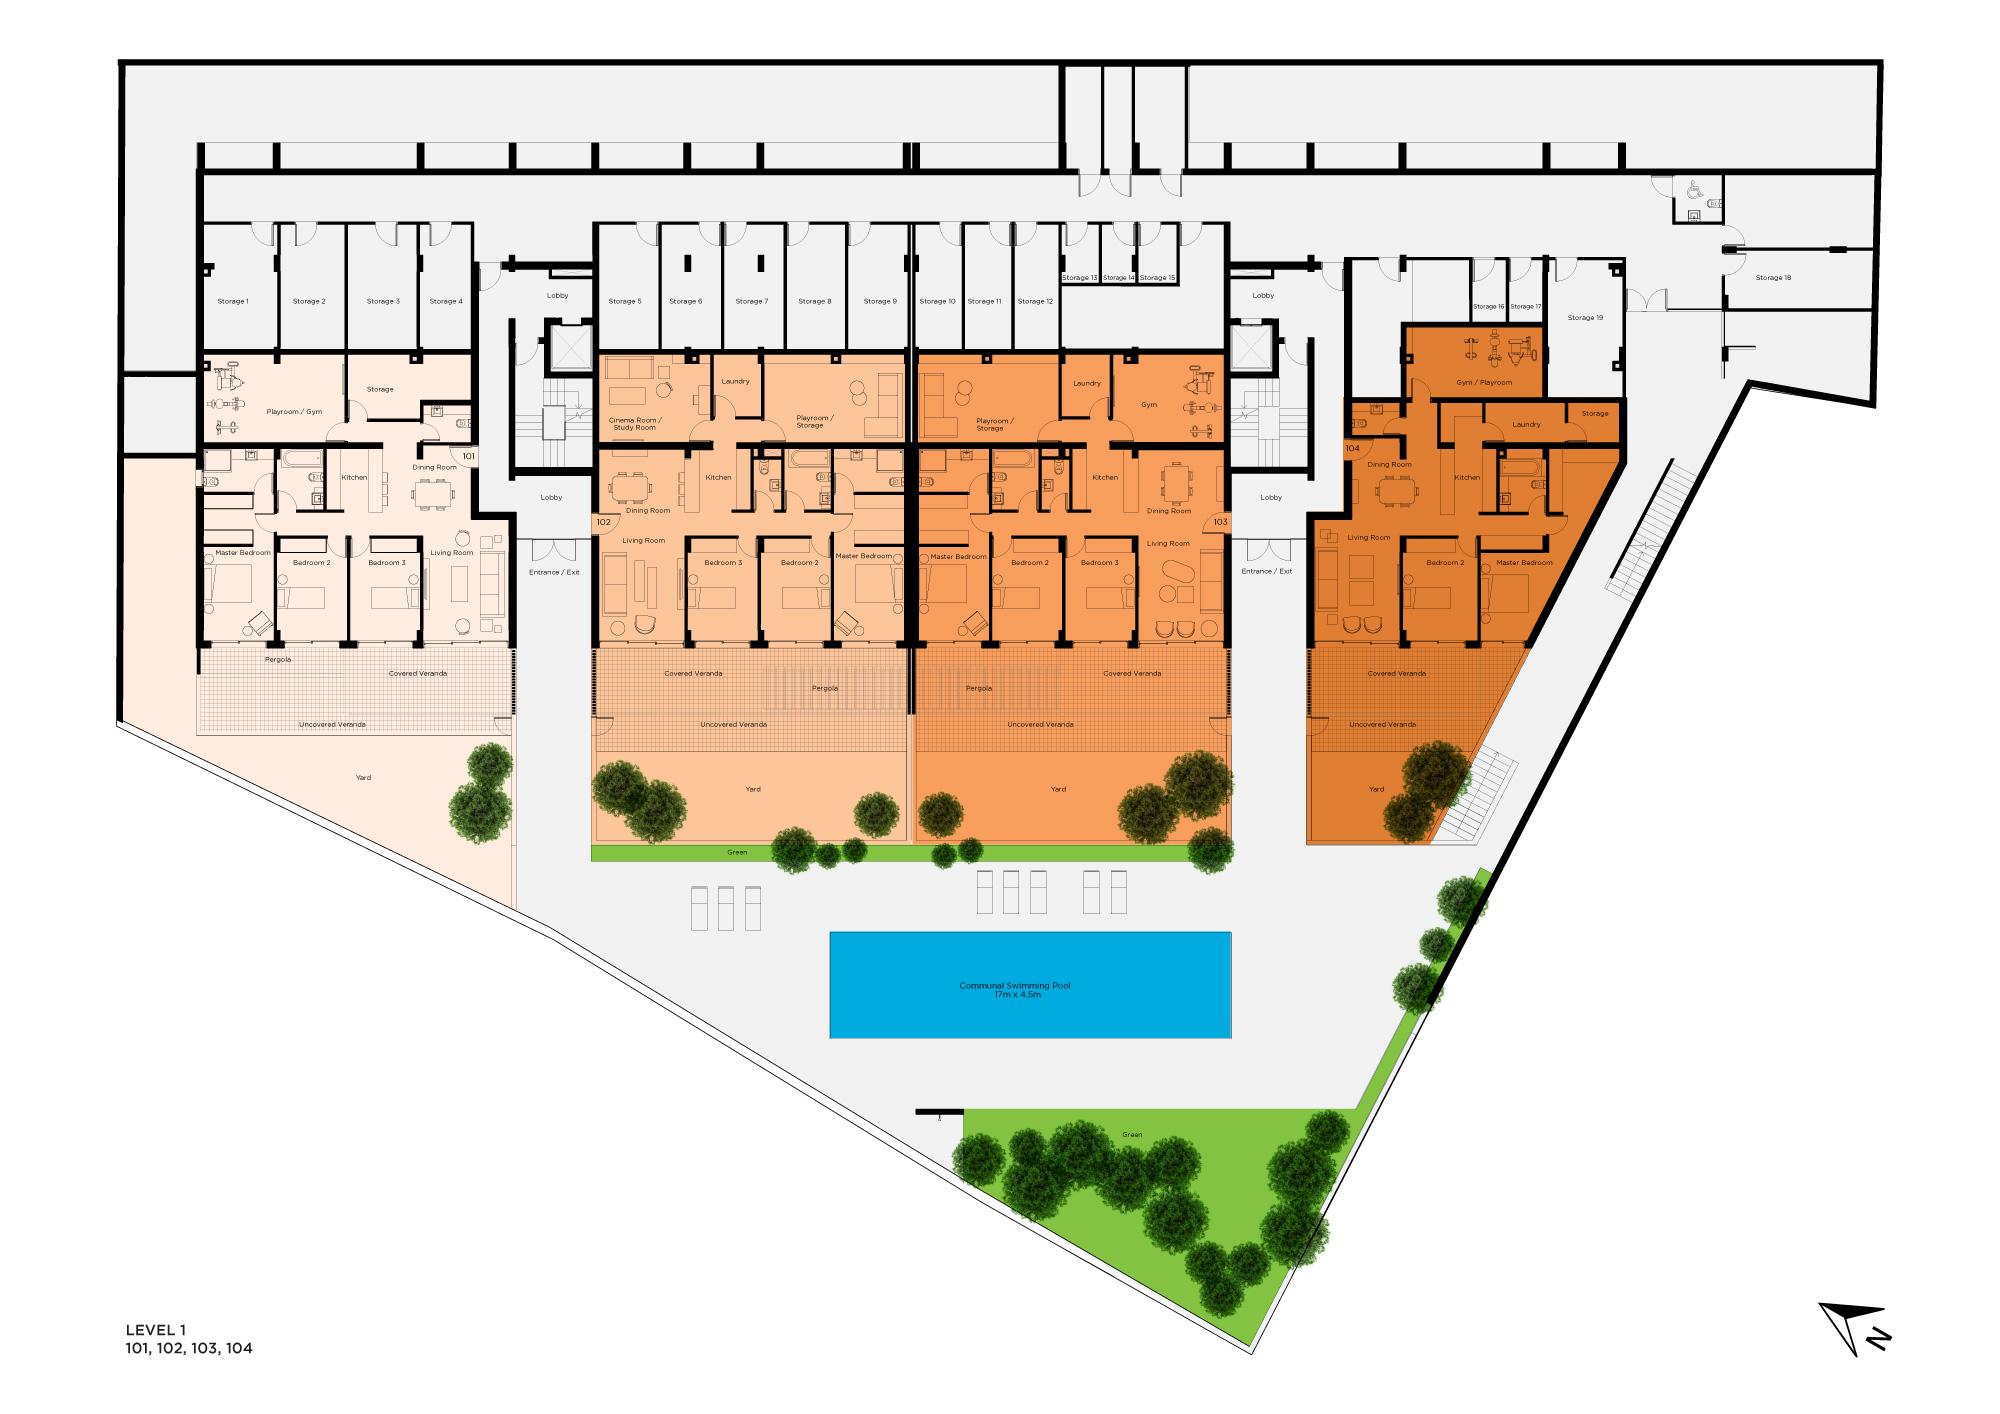 Pantheon Hill Level 1 Floorplan